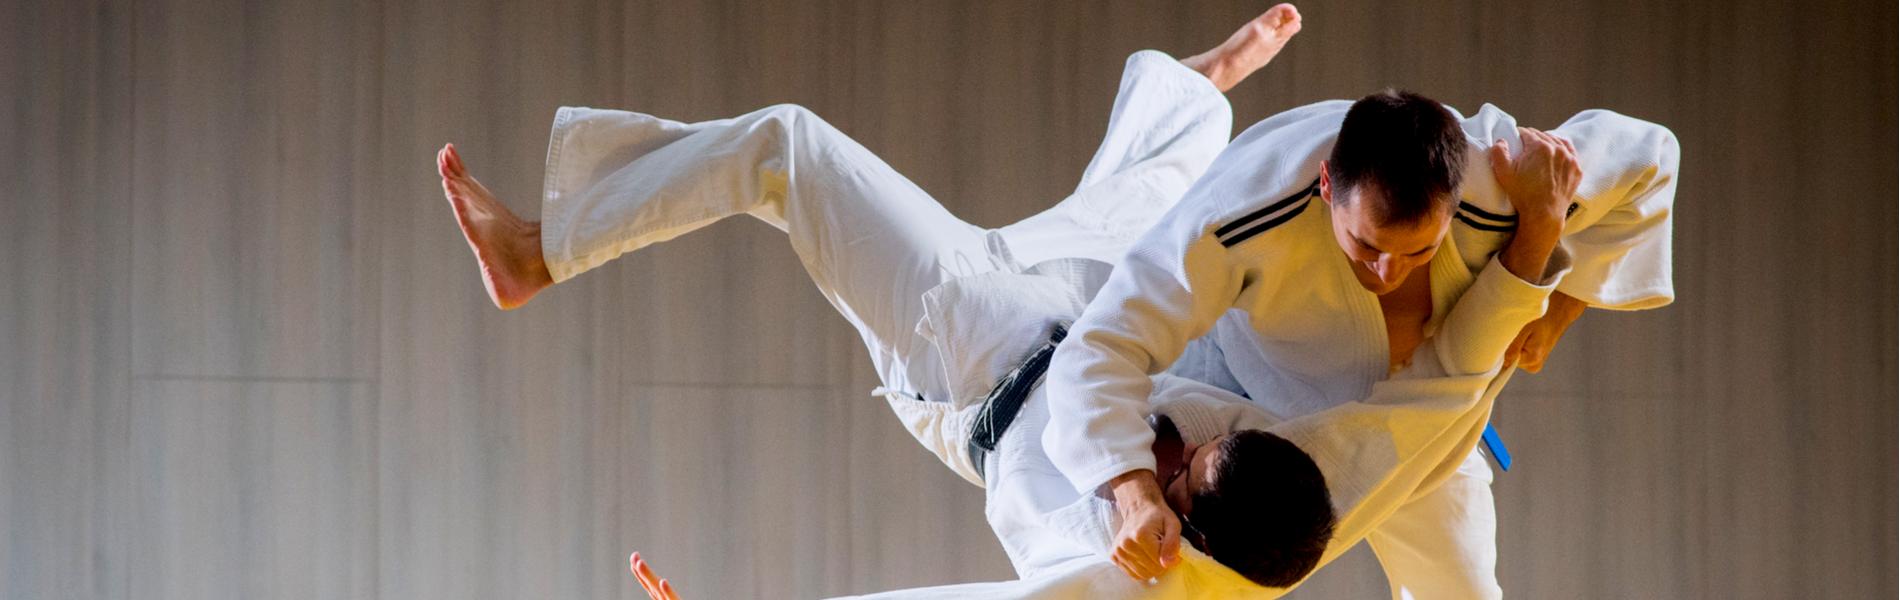 Private Lessons Martial Arts School